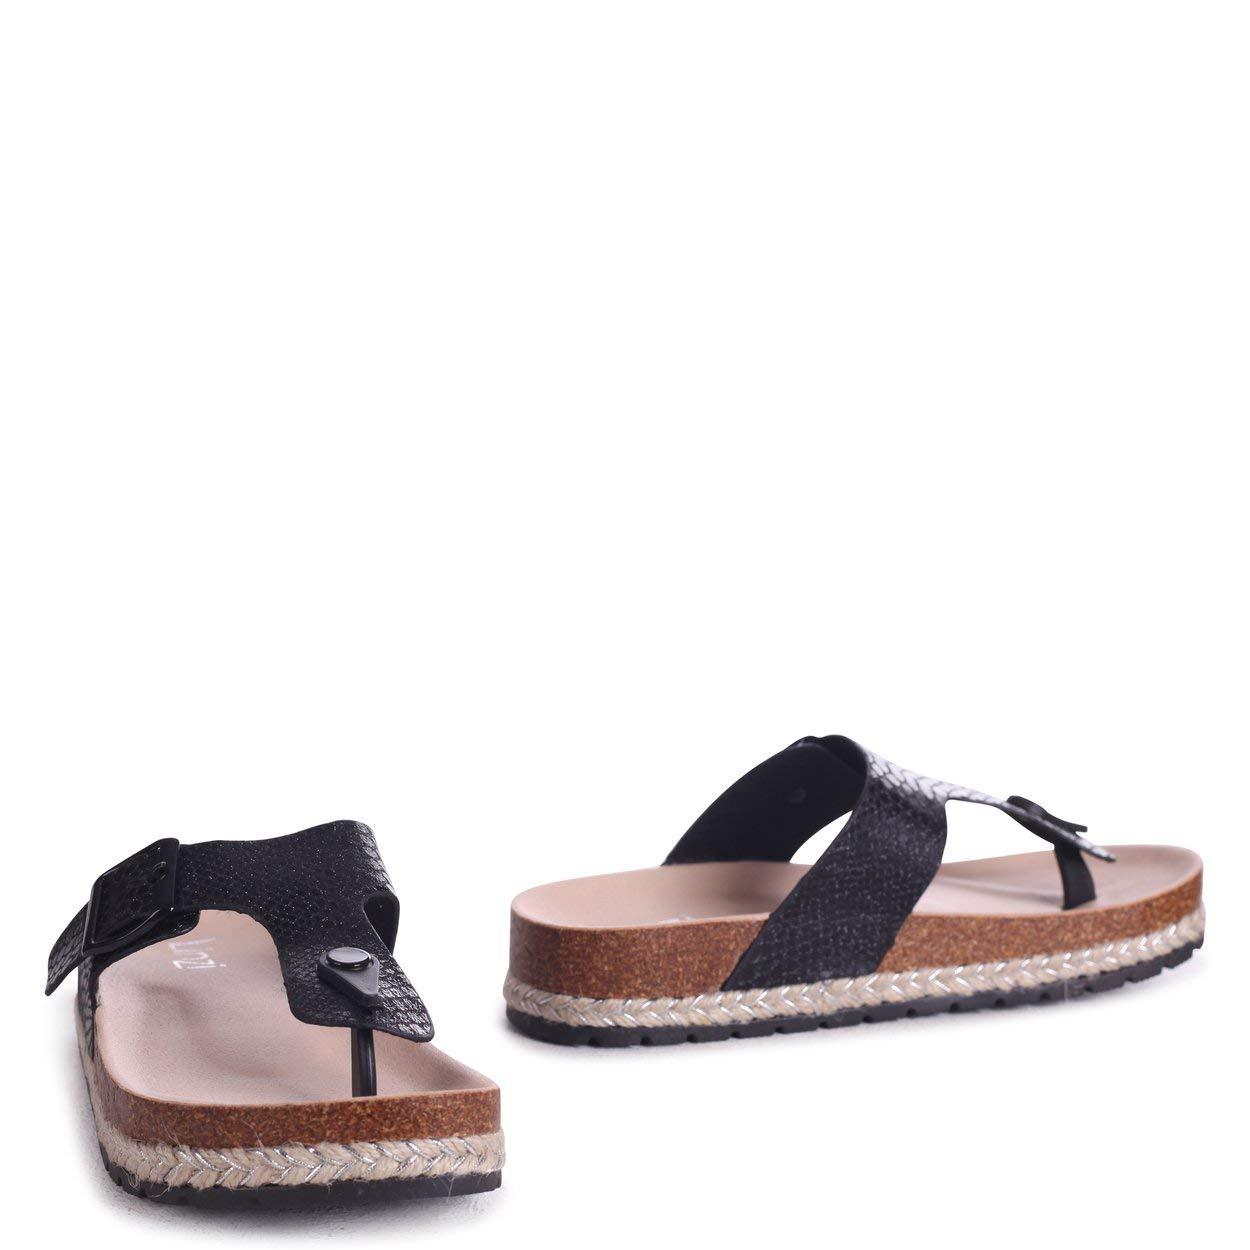 c1aead82d5b Linzi Monica - Black Snake Toe Post Flatform Sandal  Amazon.co.uk  Shoes    Bags